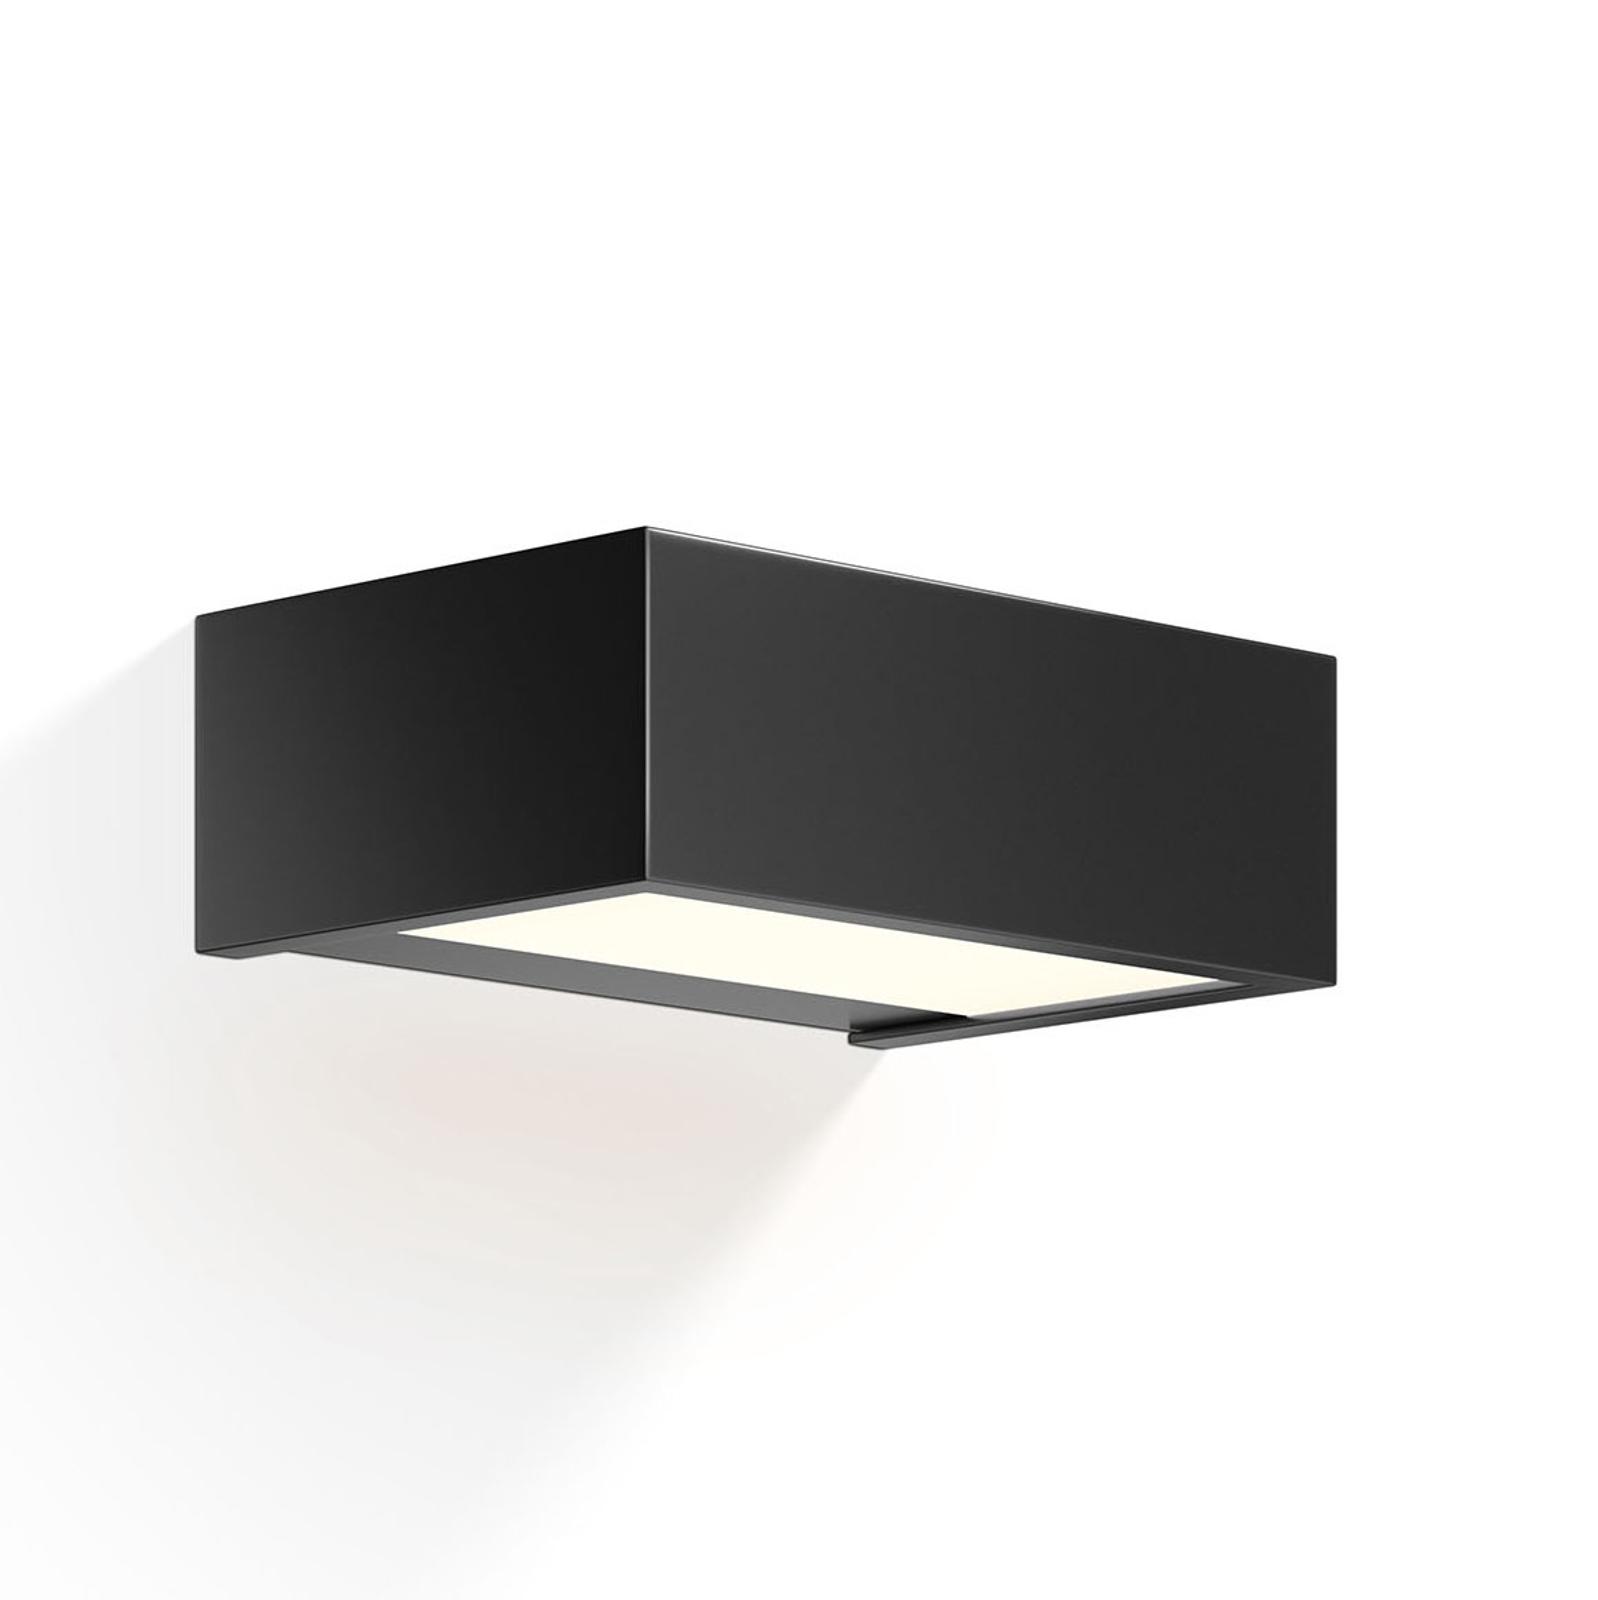 Decor Walther Box LED-lampa svart 2700K 15 cm